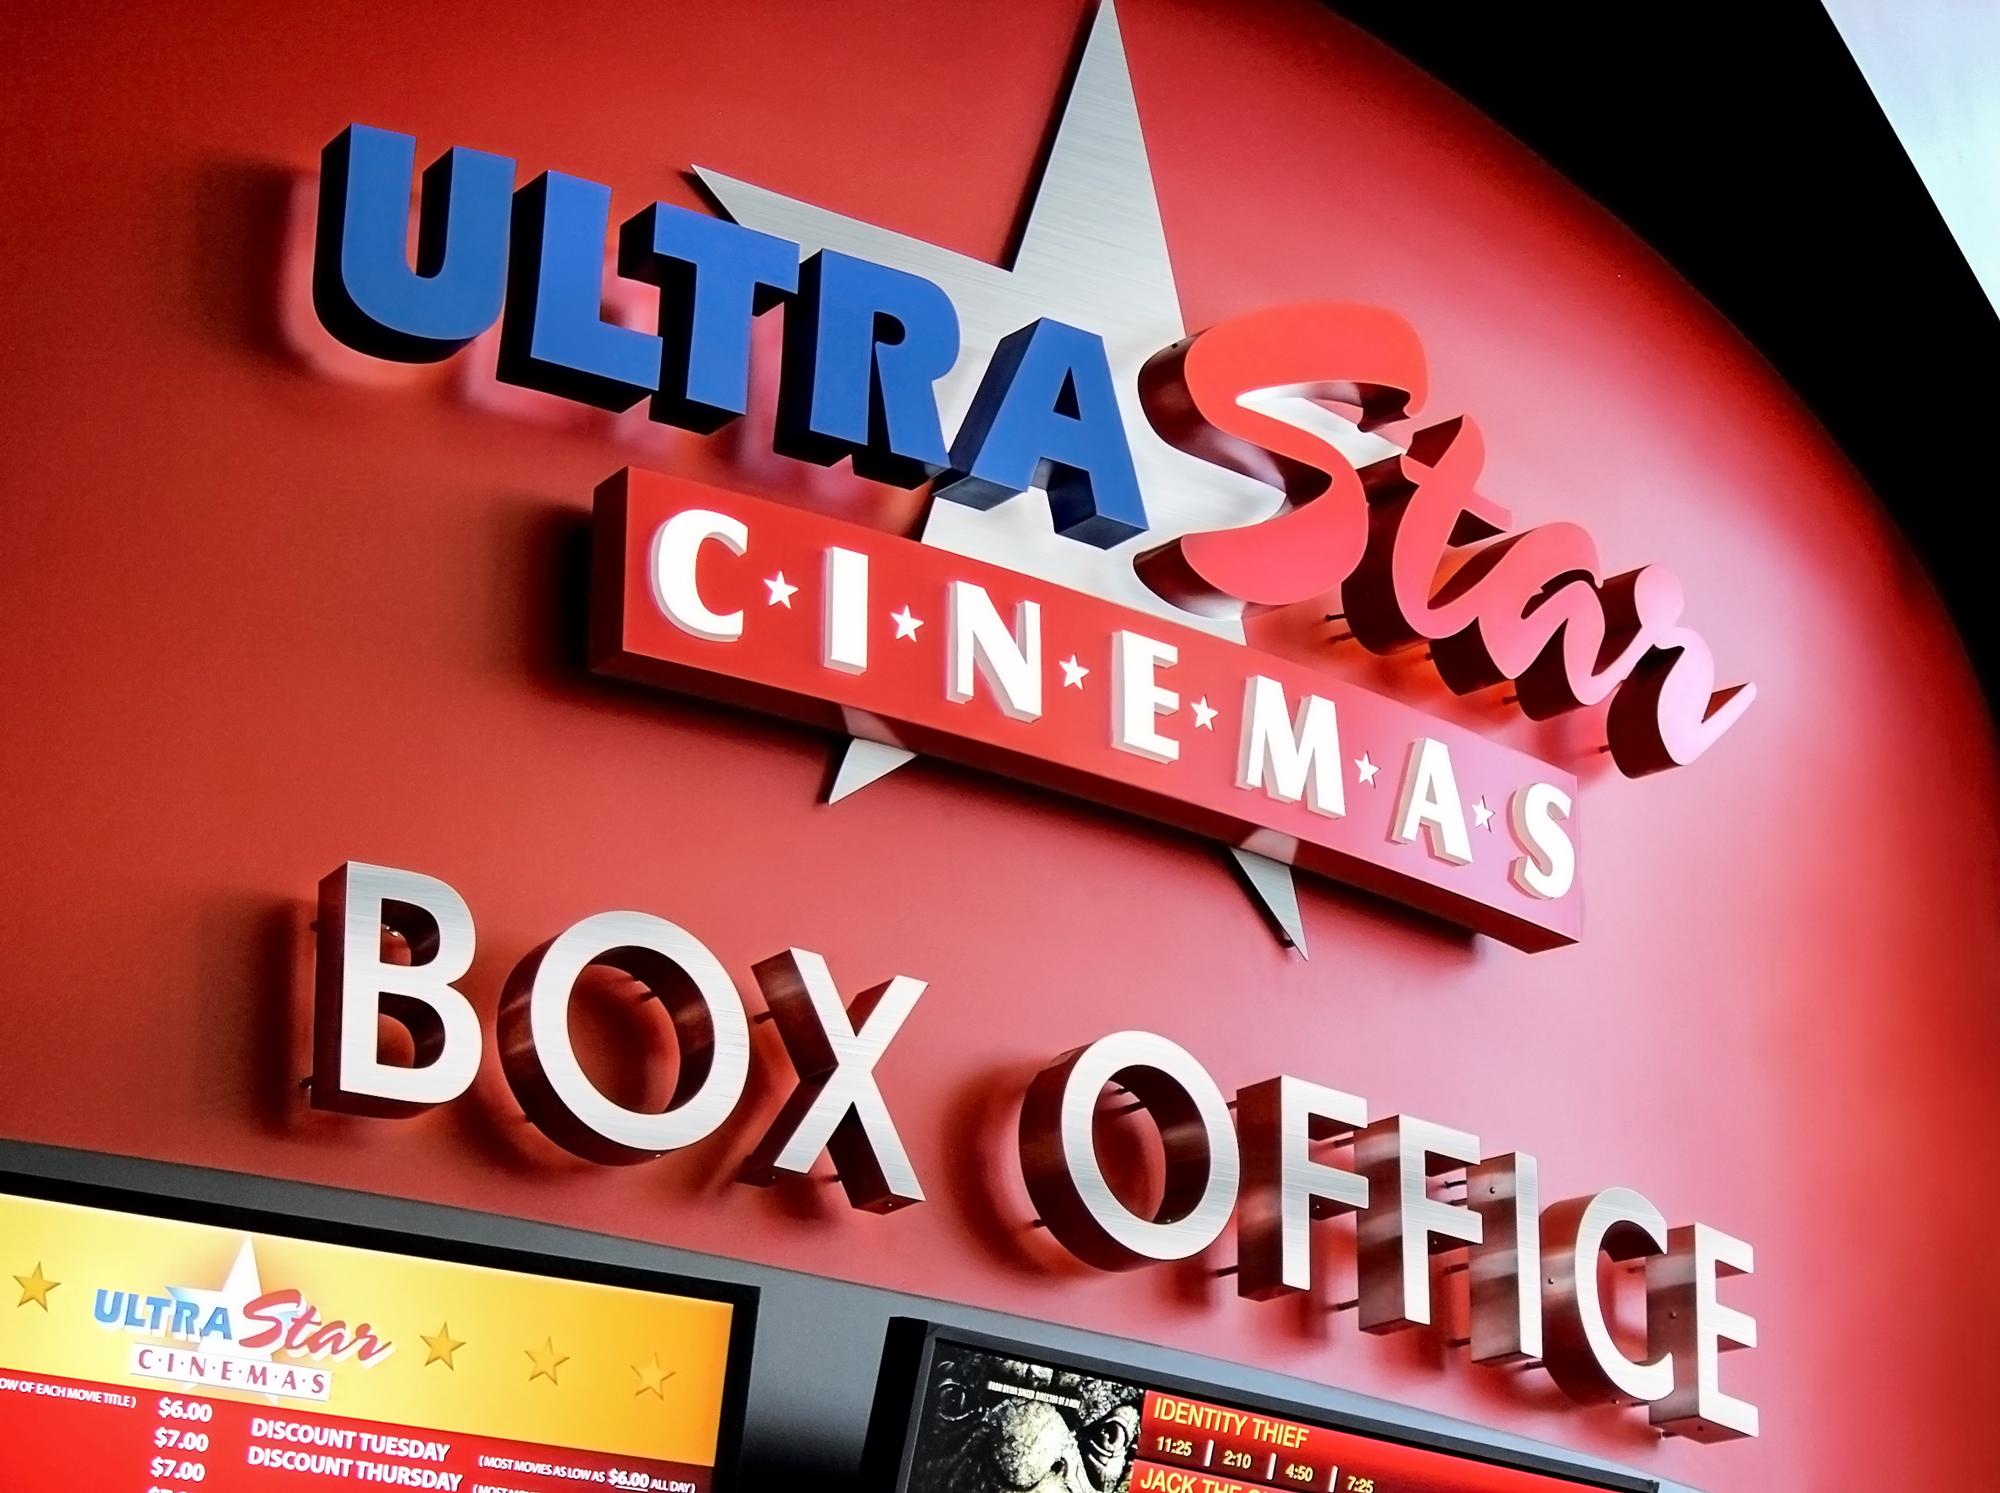 UltraStar Cinemas logo brands the box office.